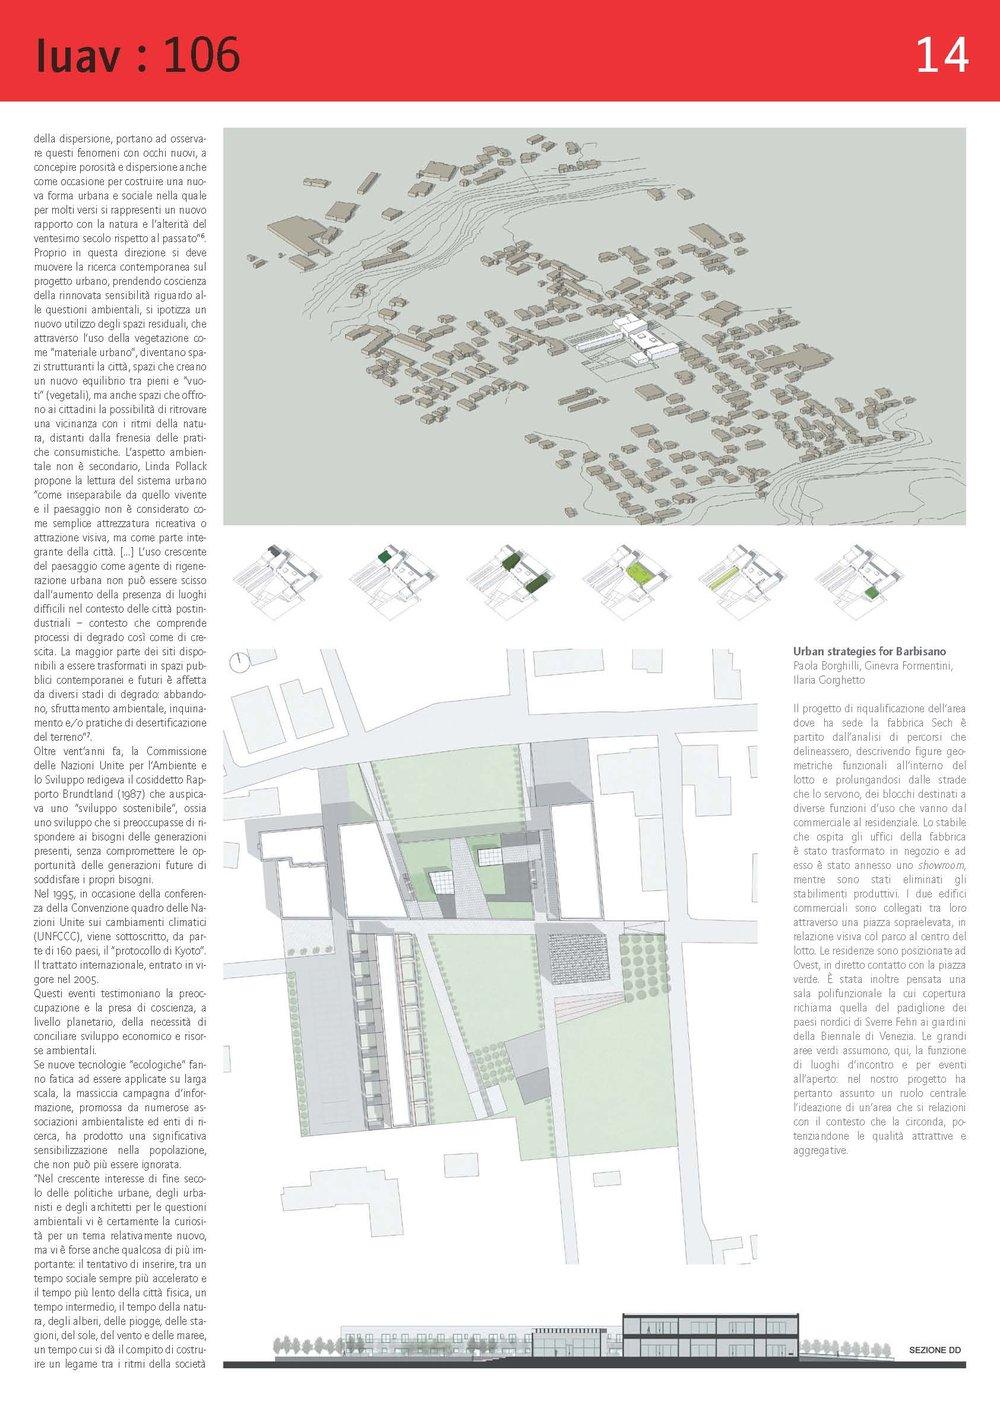 Copertine_Pagina_15.jpg